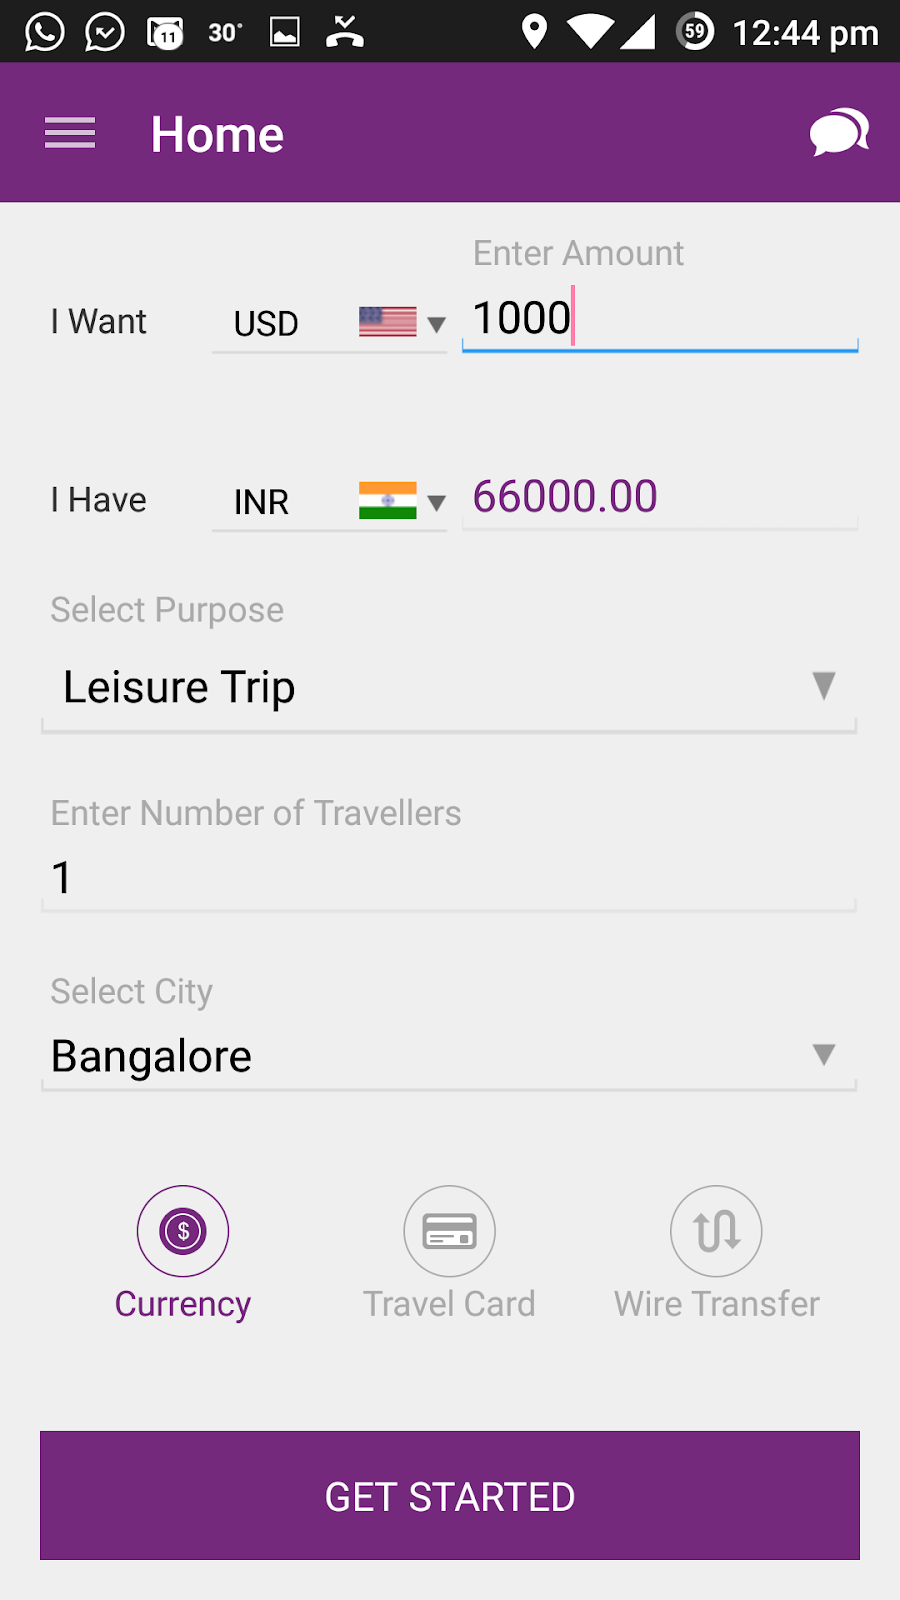 C:\Users\admin\Desktop\Fxkart_Forex Booking Mobile App_Pic 1.png